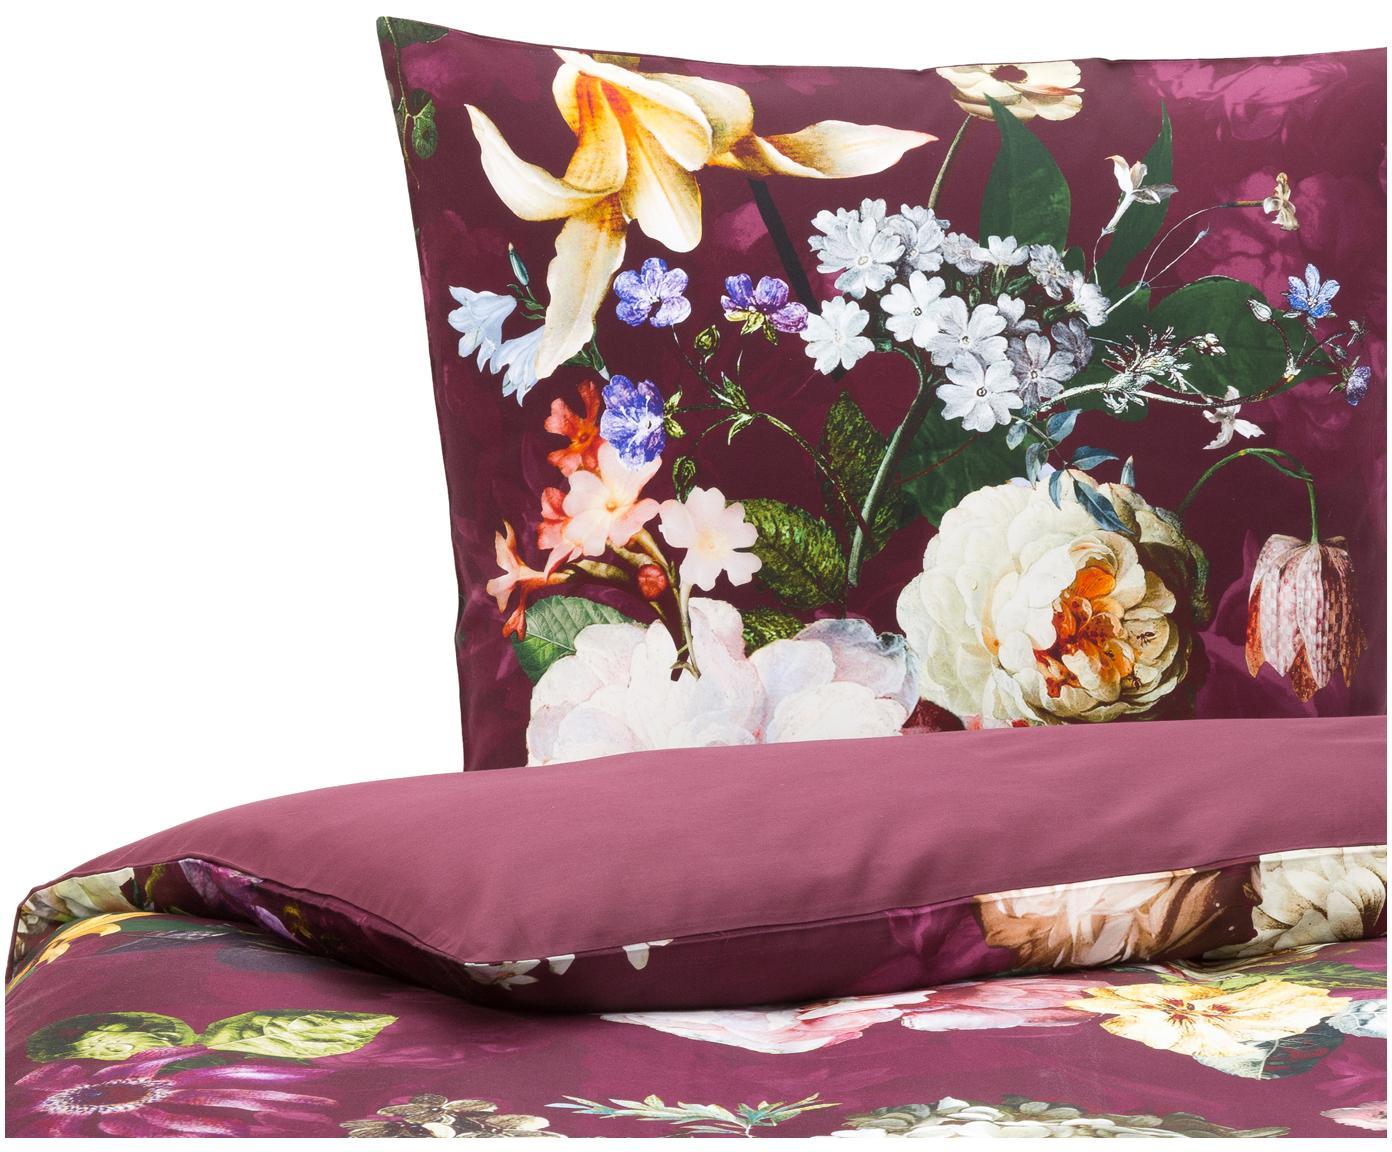 Katoenen dekbedovertrek Fleur, Bordeauxrood, 140 x 220 cm